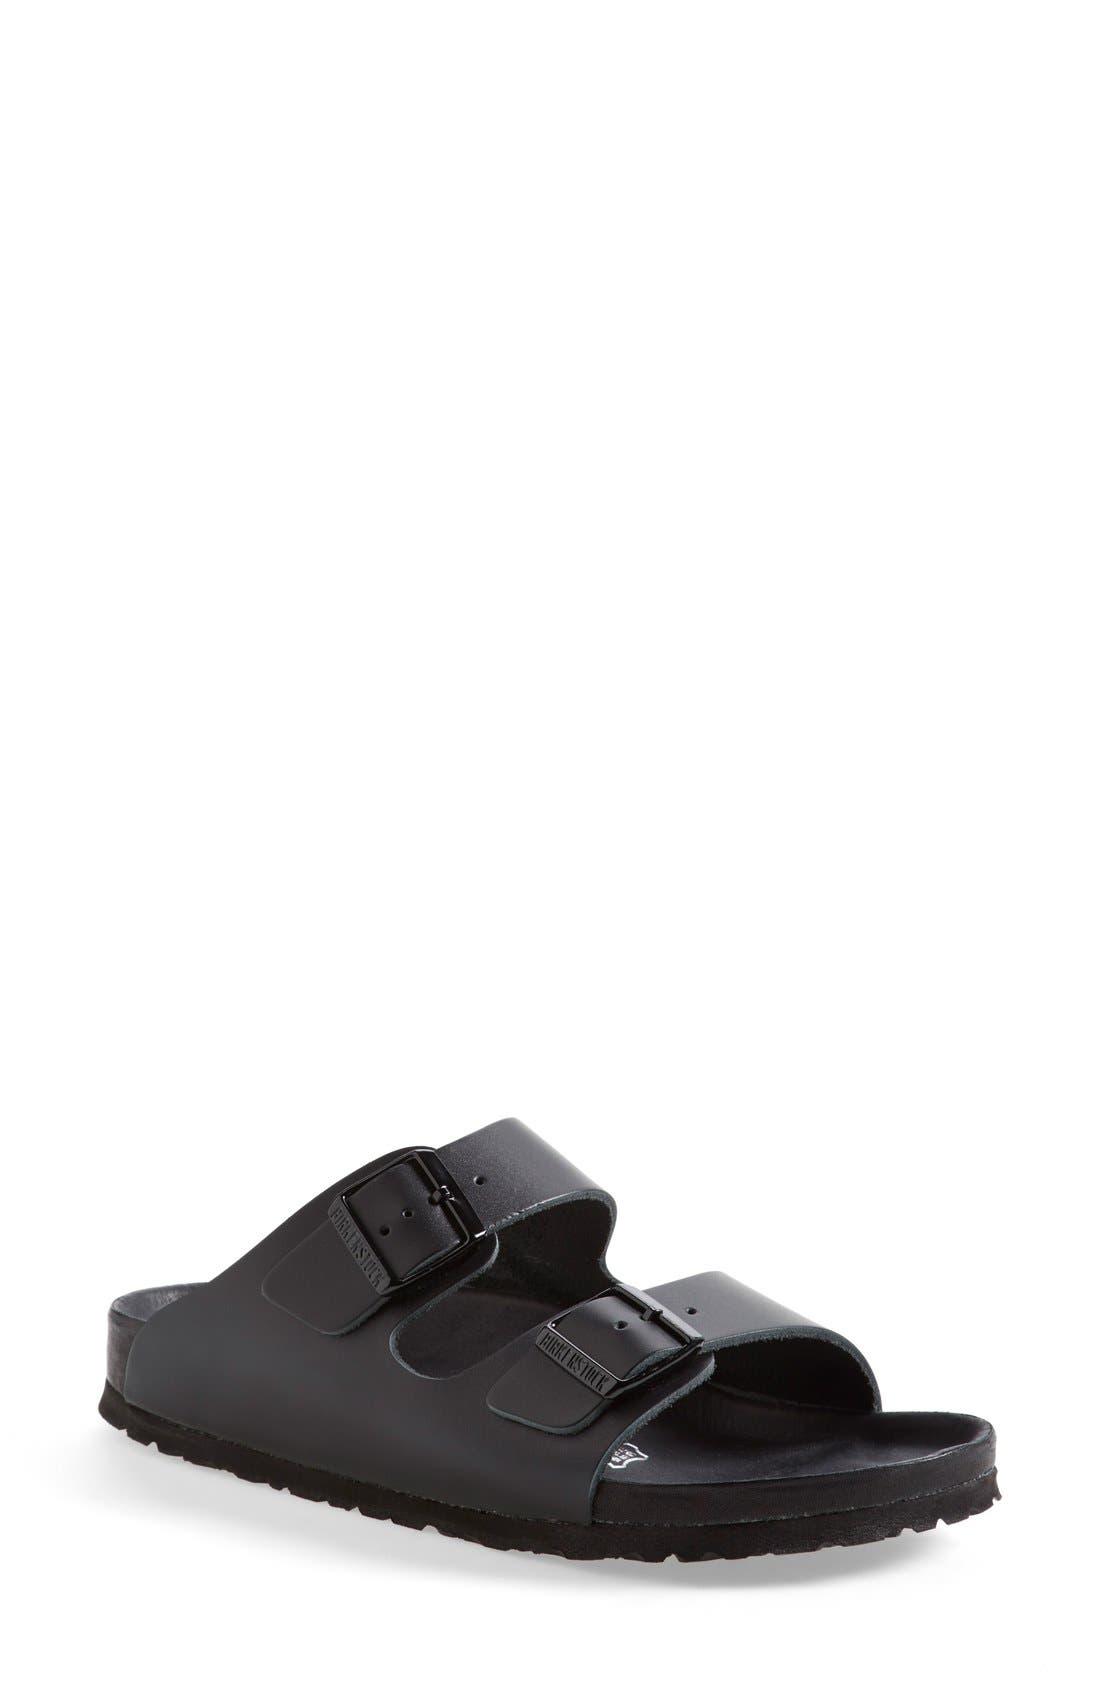 Main Image - Birkenstock 'Monterey' Leather Sandal